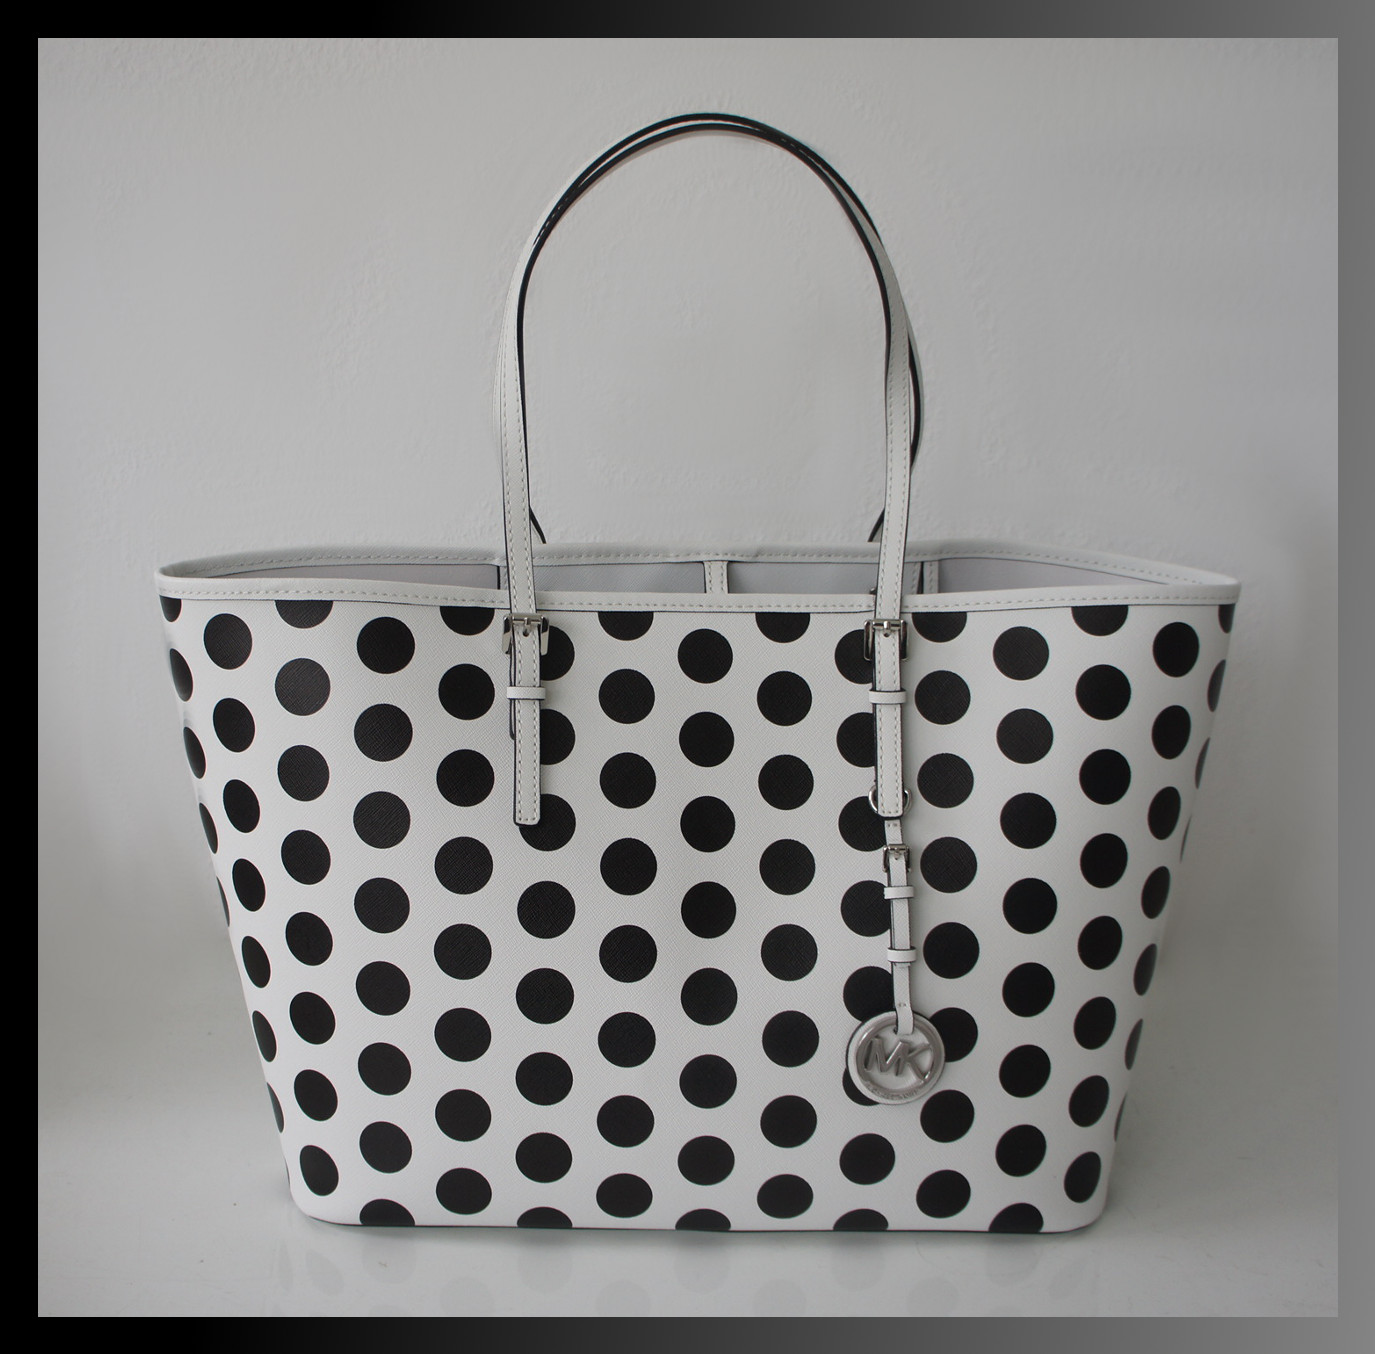 michael kors tasche handtasche gro saffiano leder weiss schwarz neu ebay. Black Bedroom Furniture Sets. Home Design Ideas